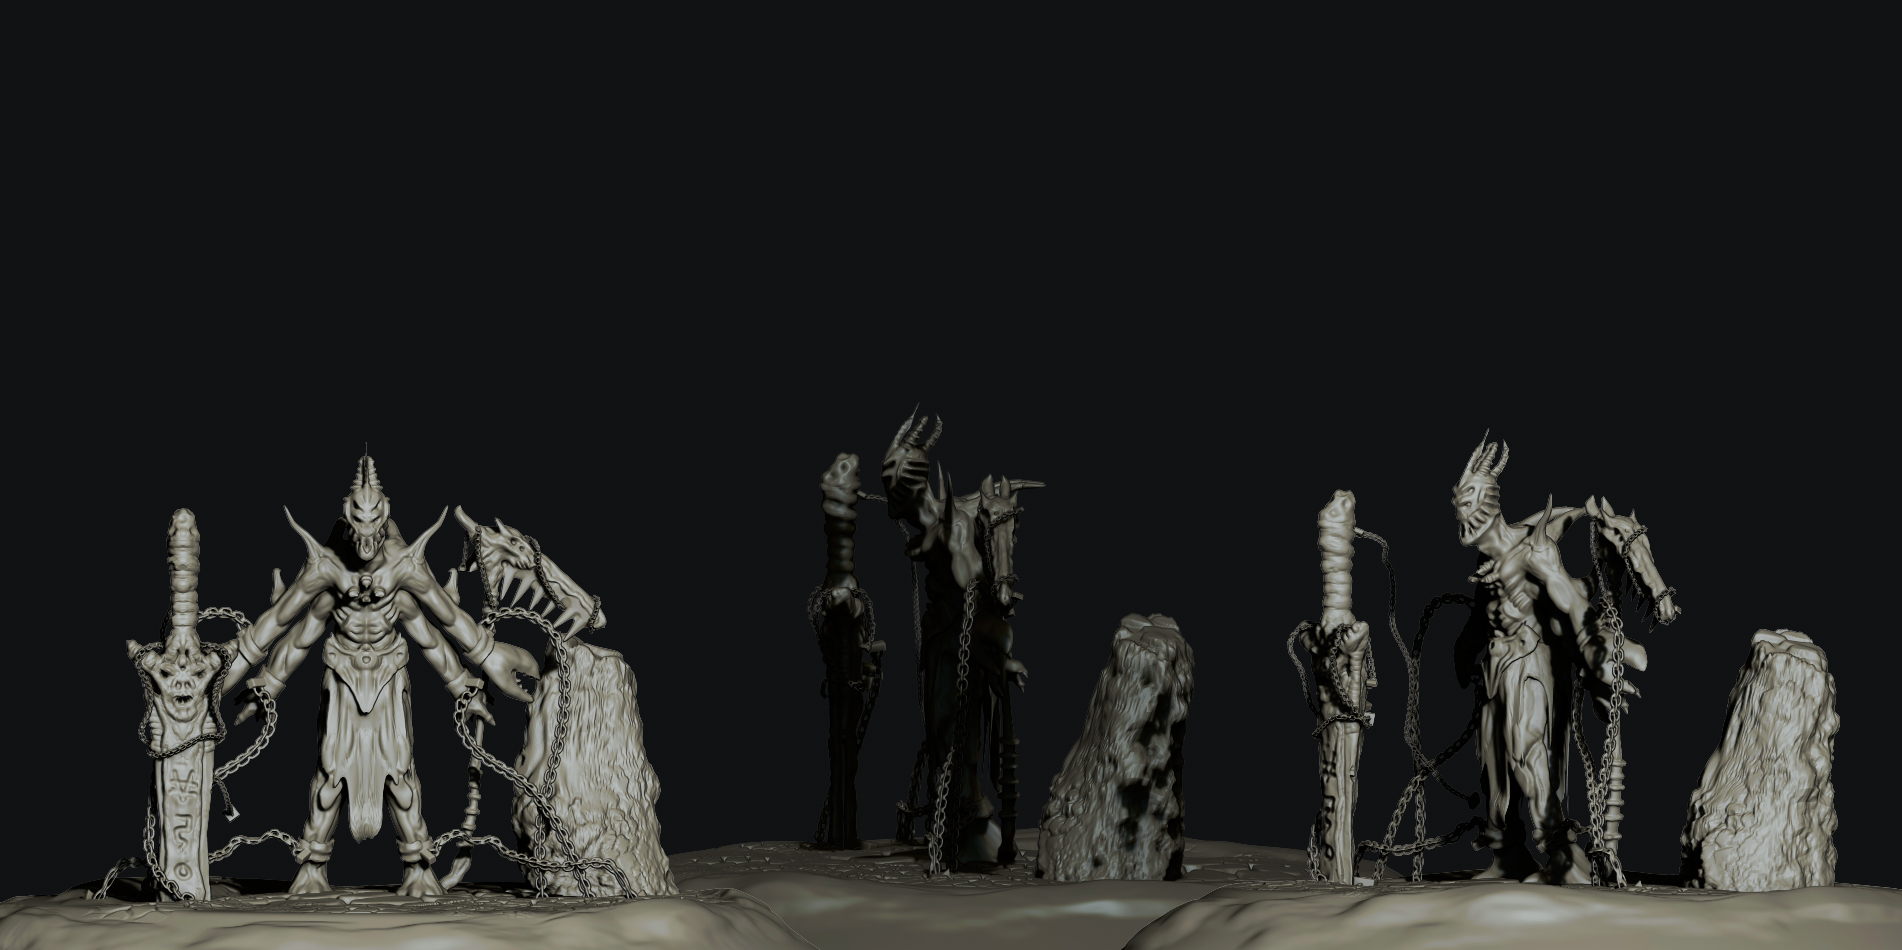 Inanimalia 2.0 by En-Vysion